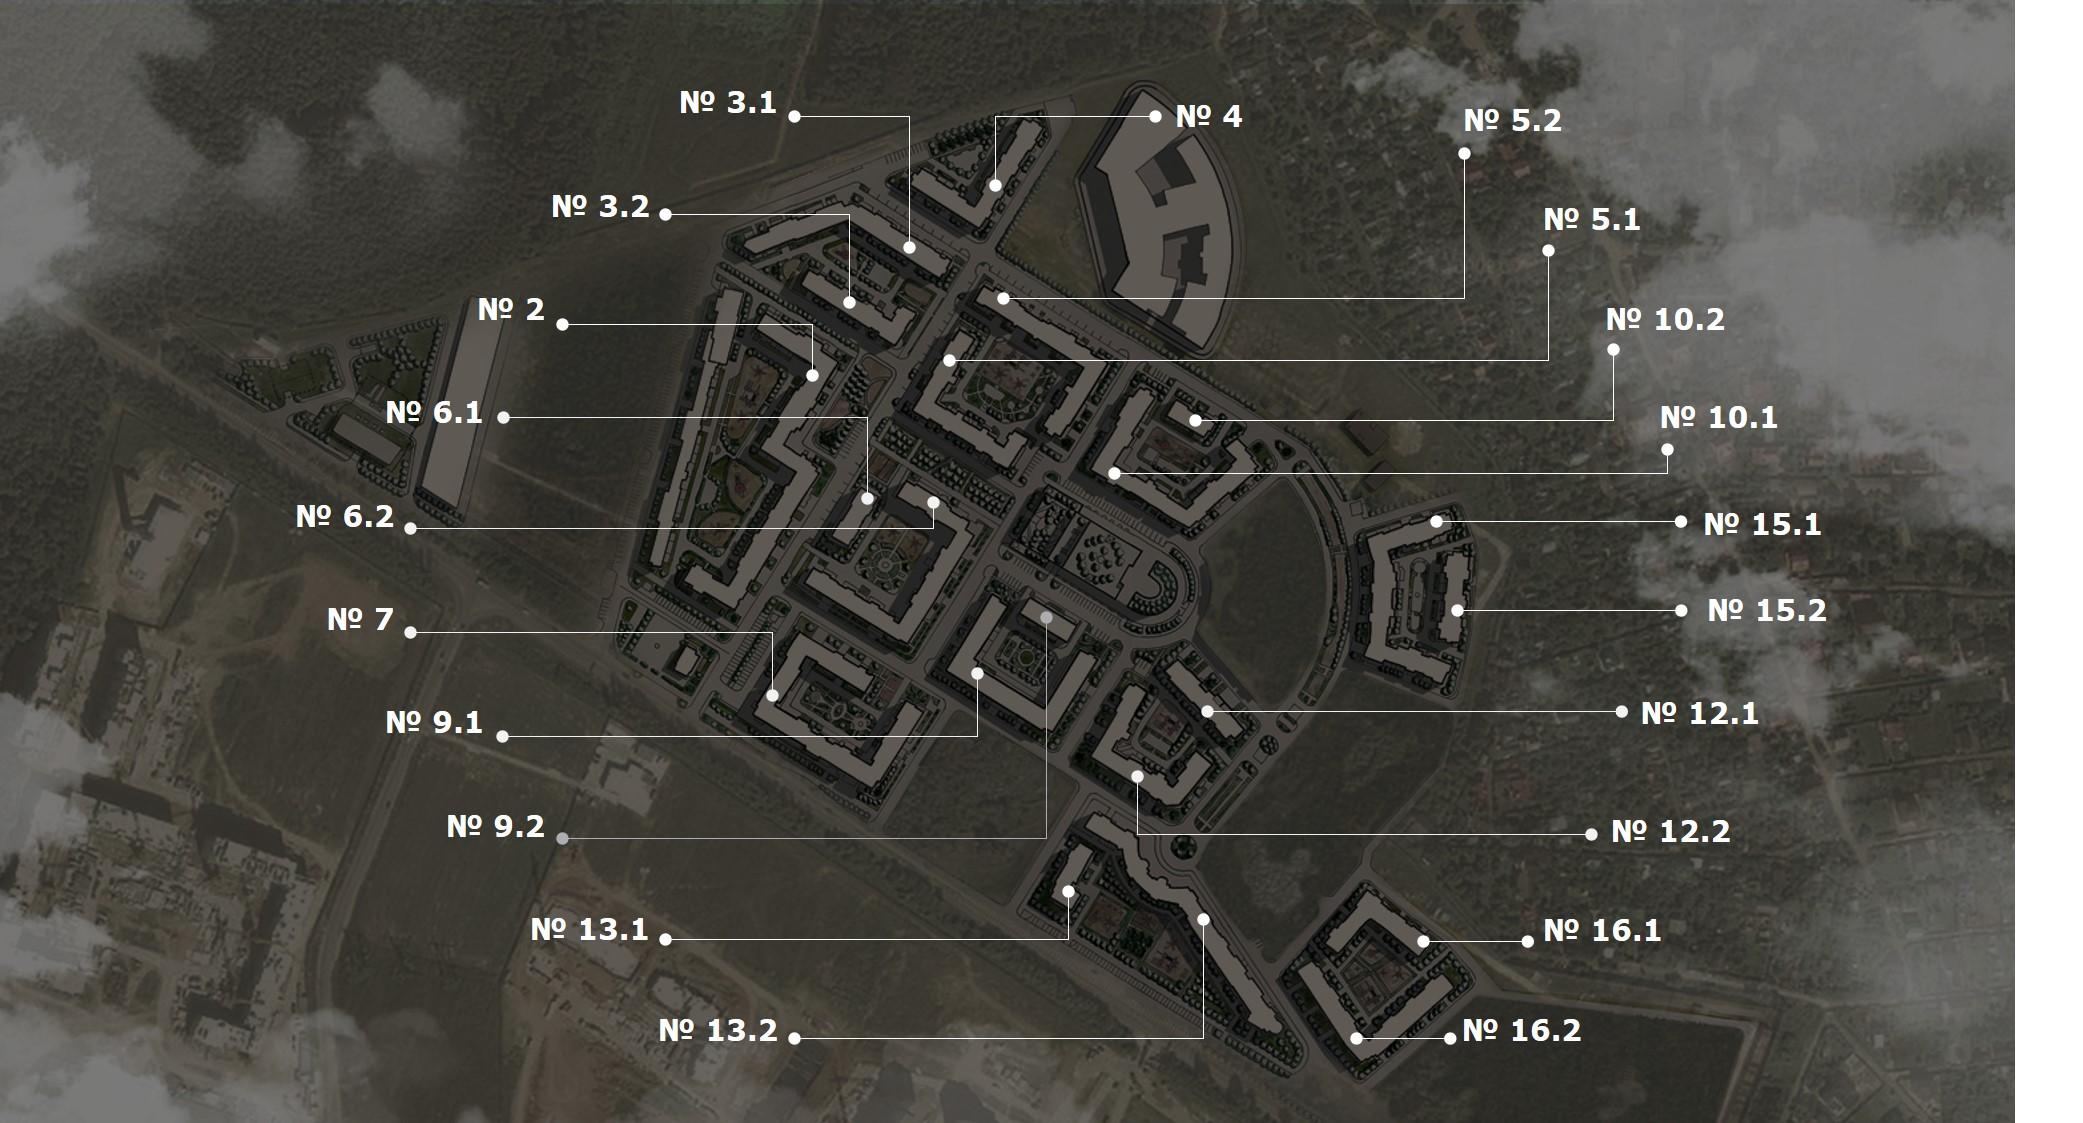 План ЖК ВГ